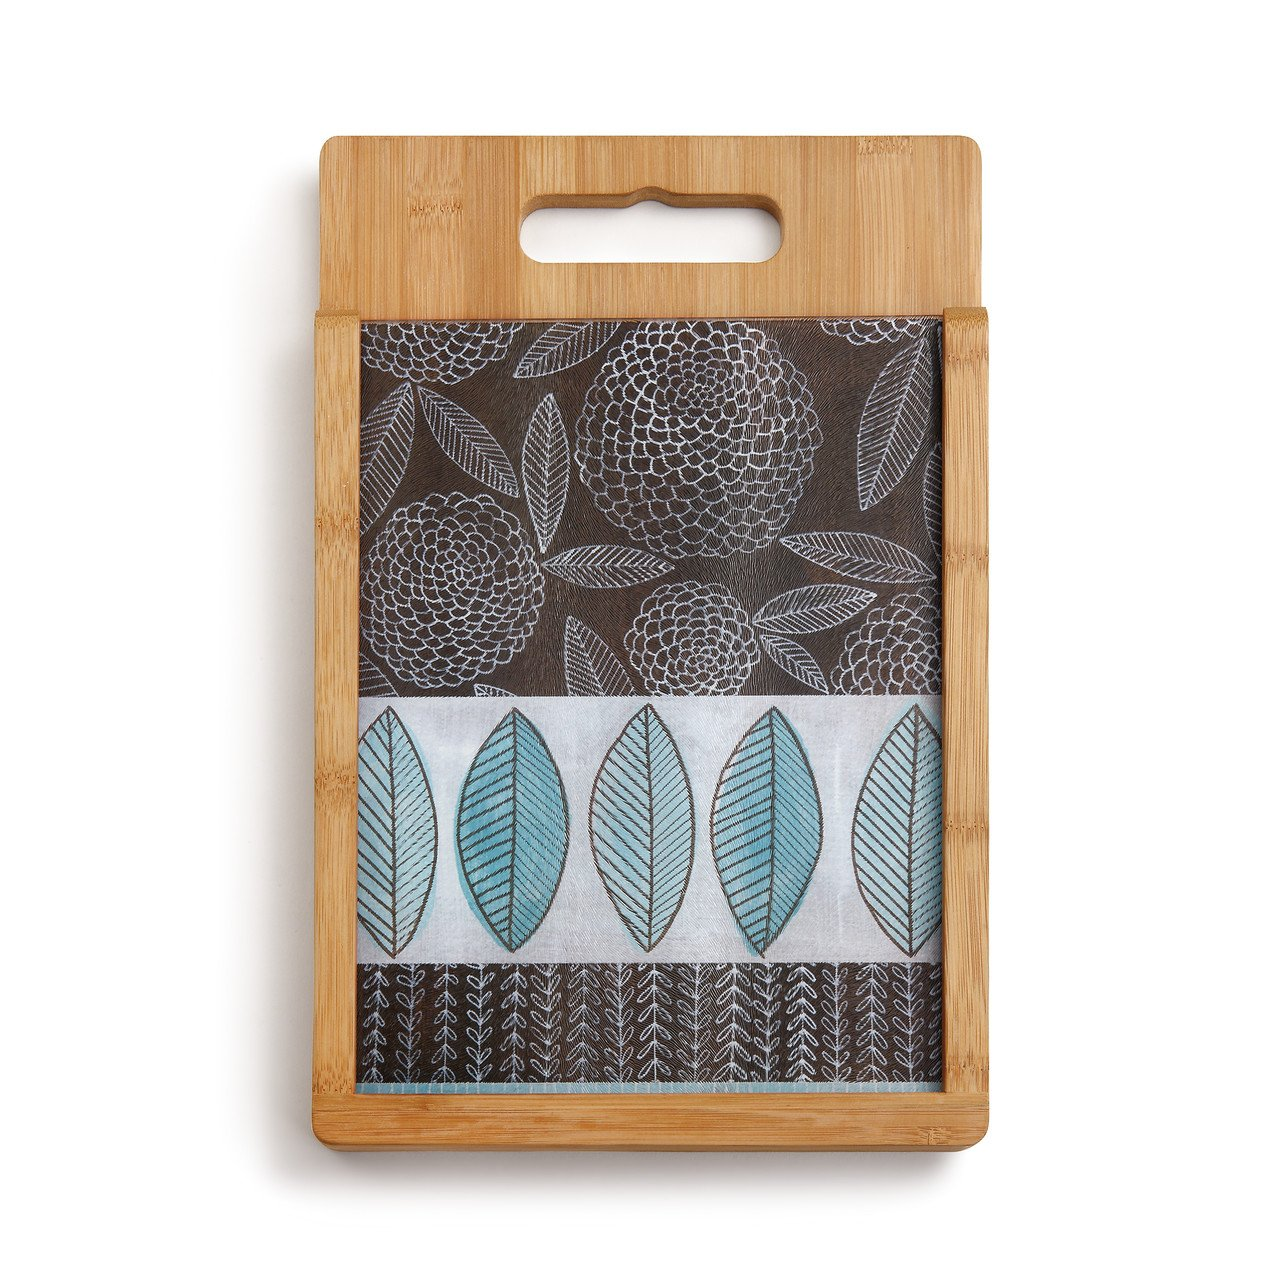 Demdaco Blue Zinnia Wood and Glass Cutting Board Set, Multicolor